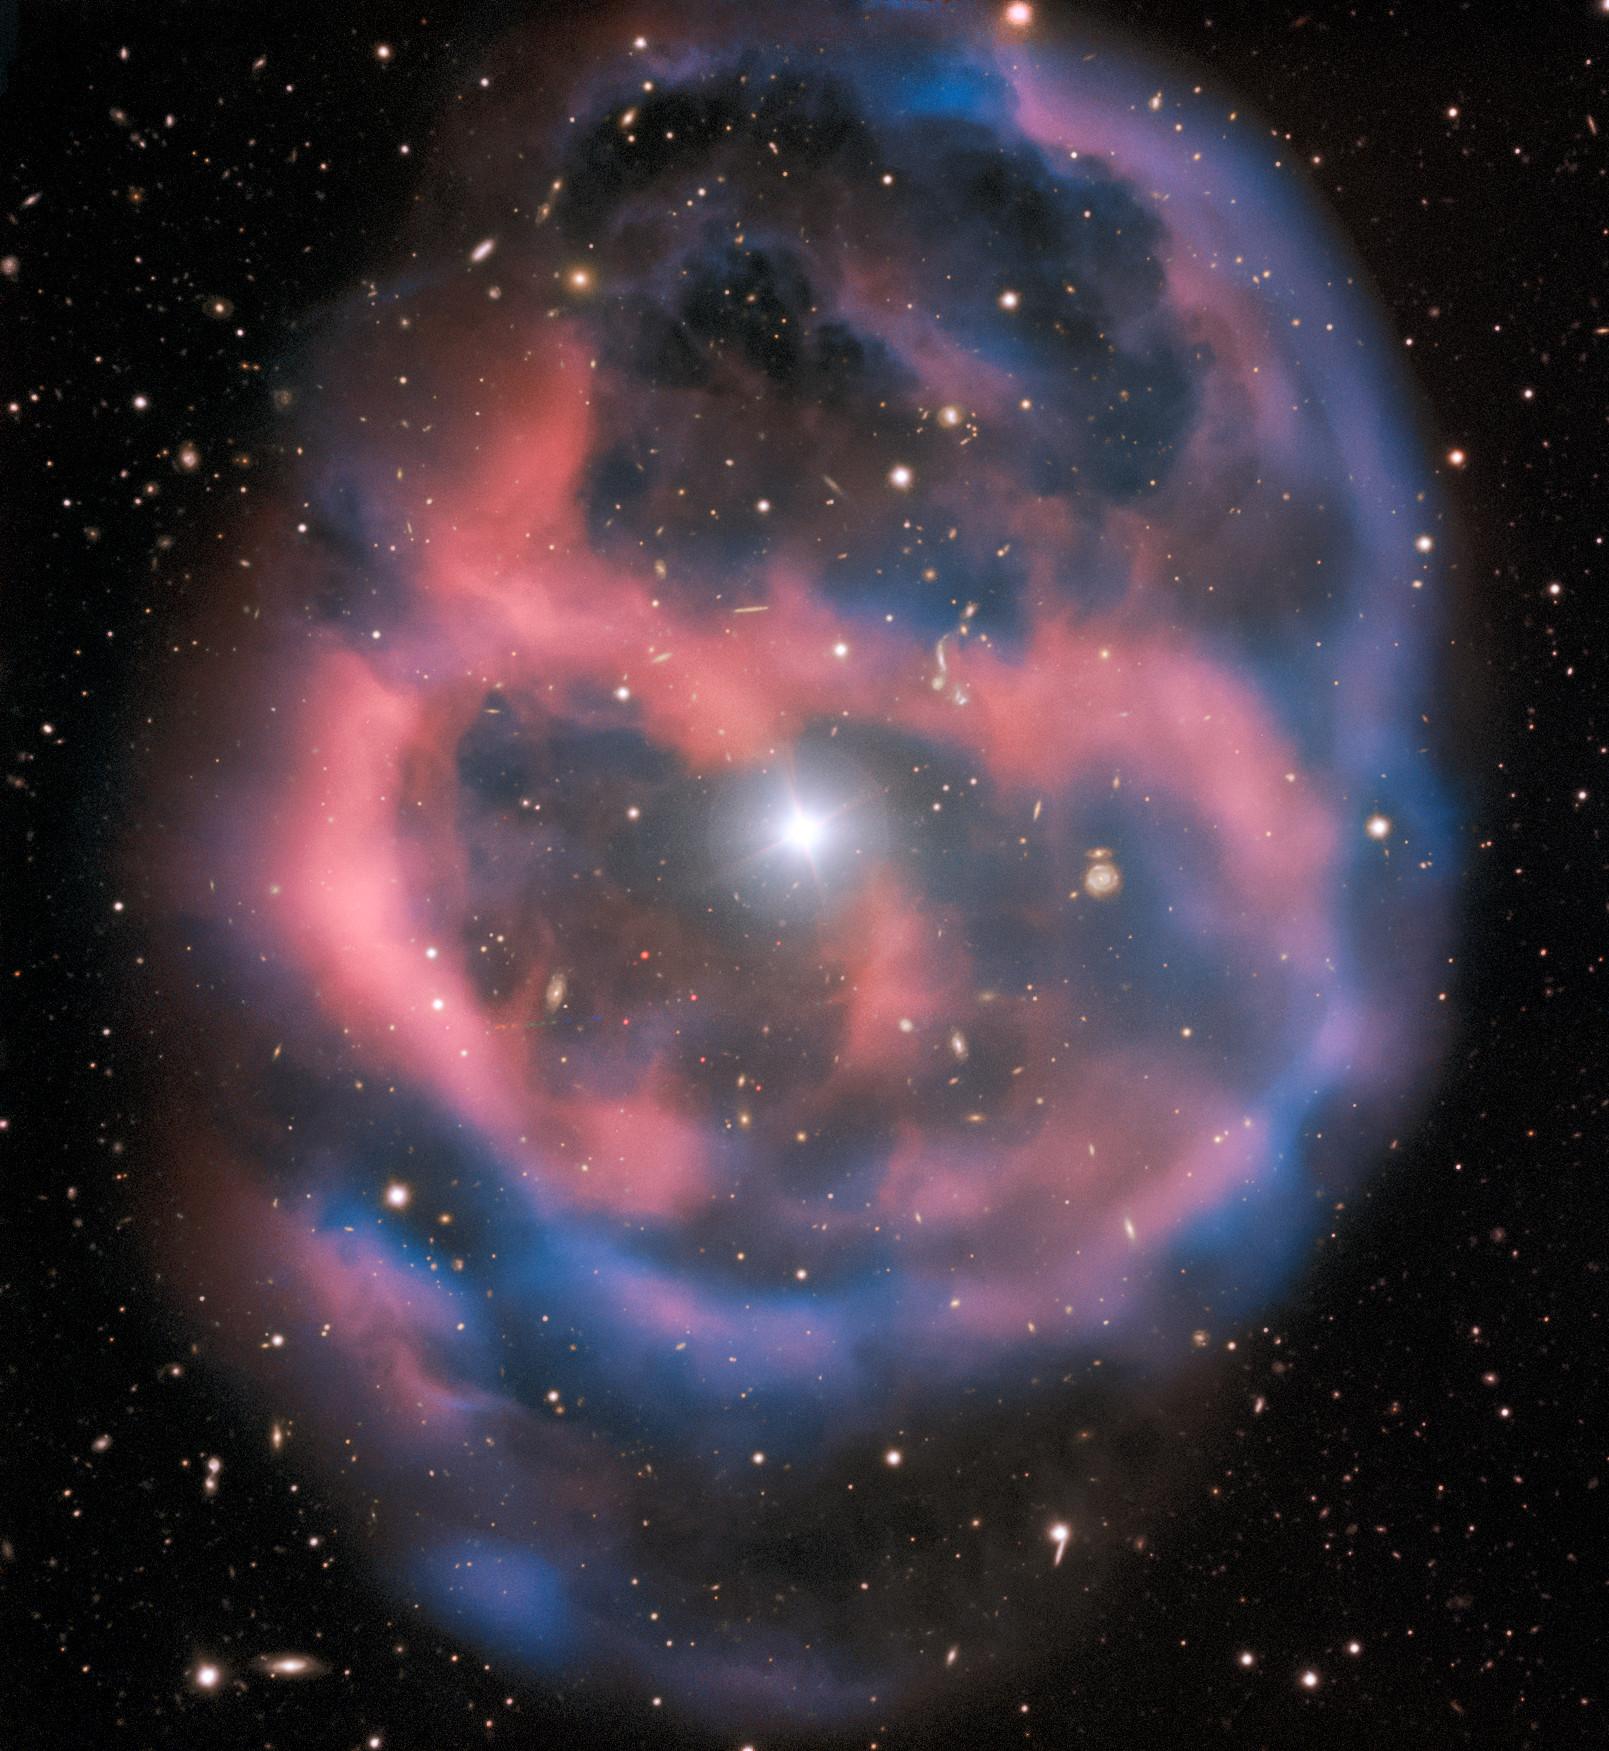 ESO 577-24, a planetary nebula